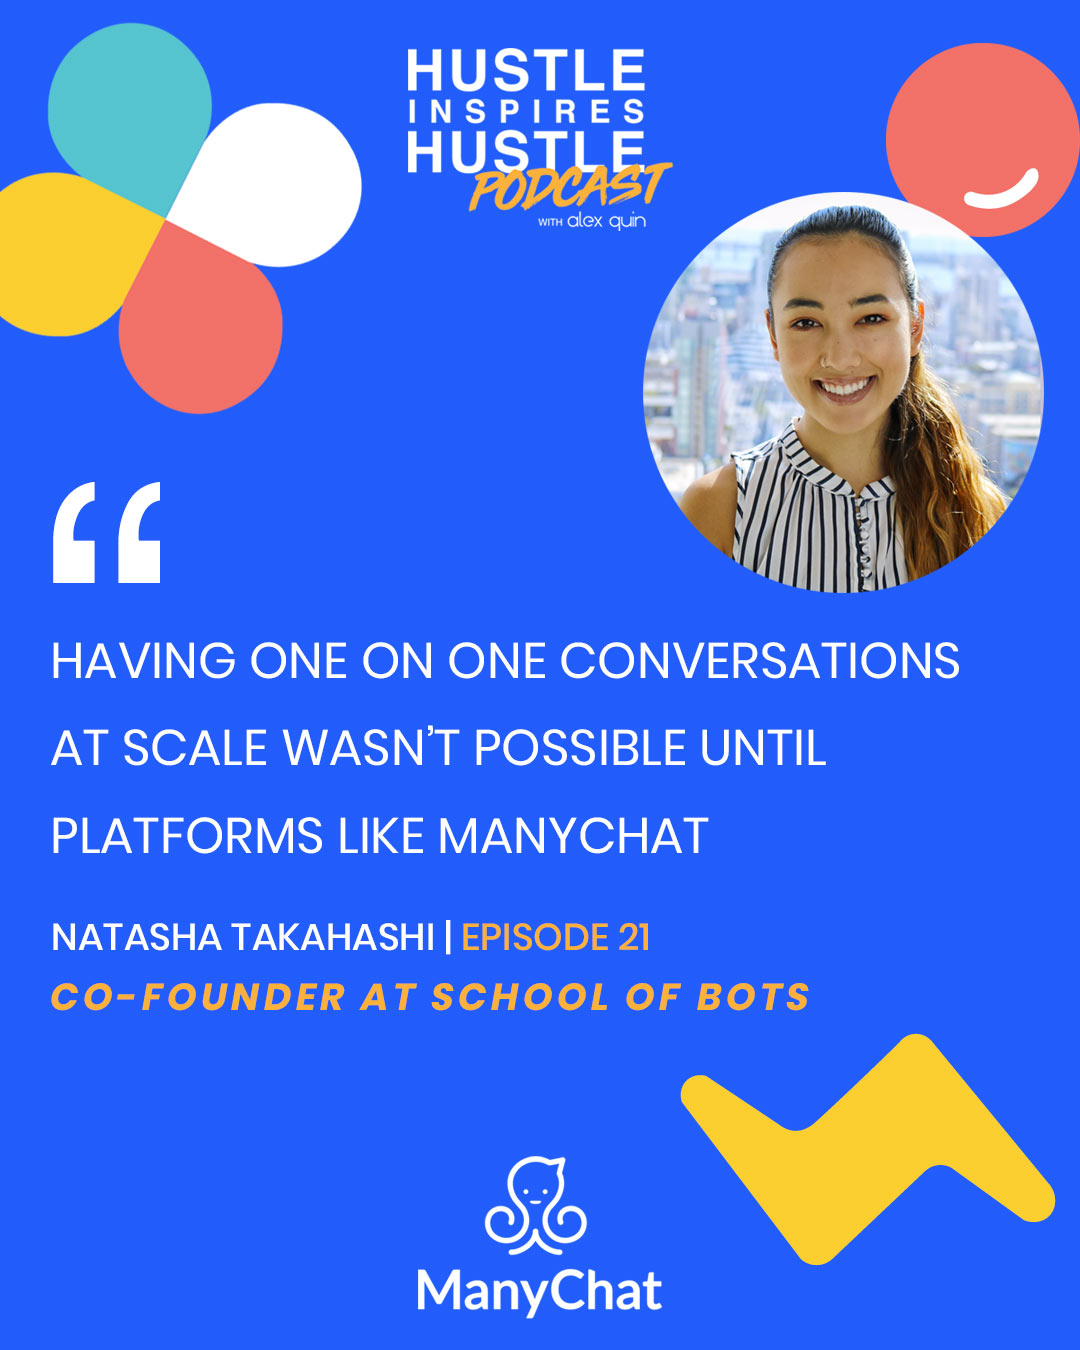 Natasha Takahashi & Alex Quin | Hustle Inspires Hustle Podcast | Manychat